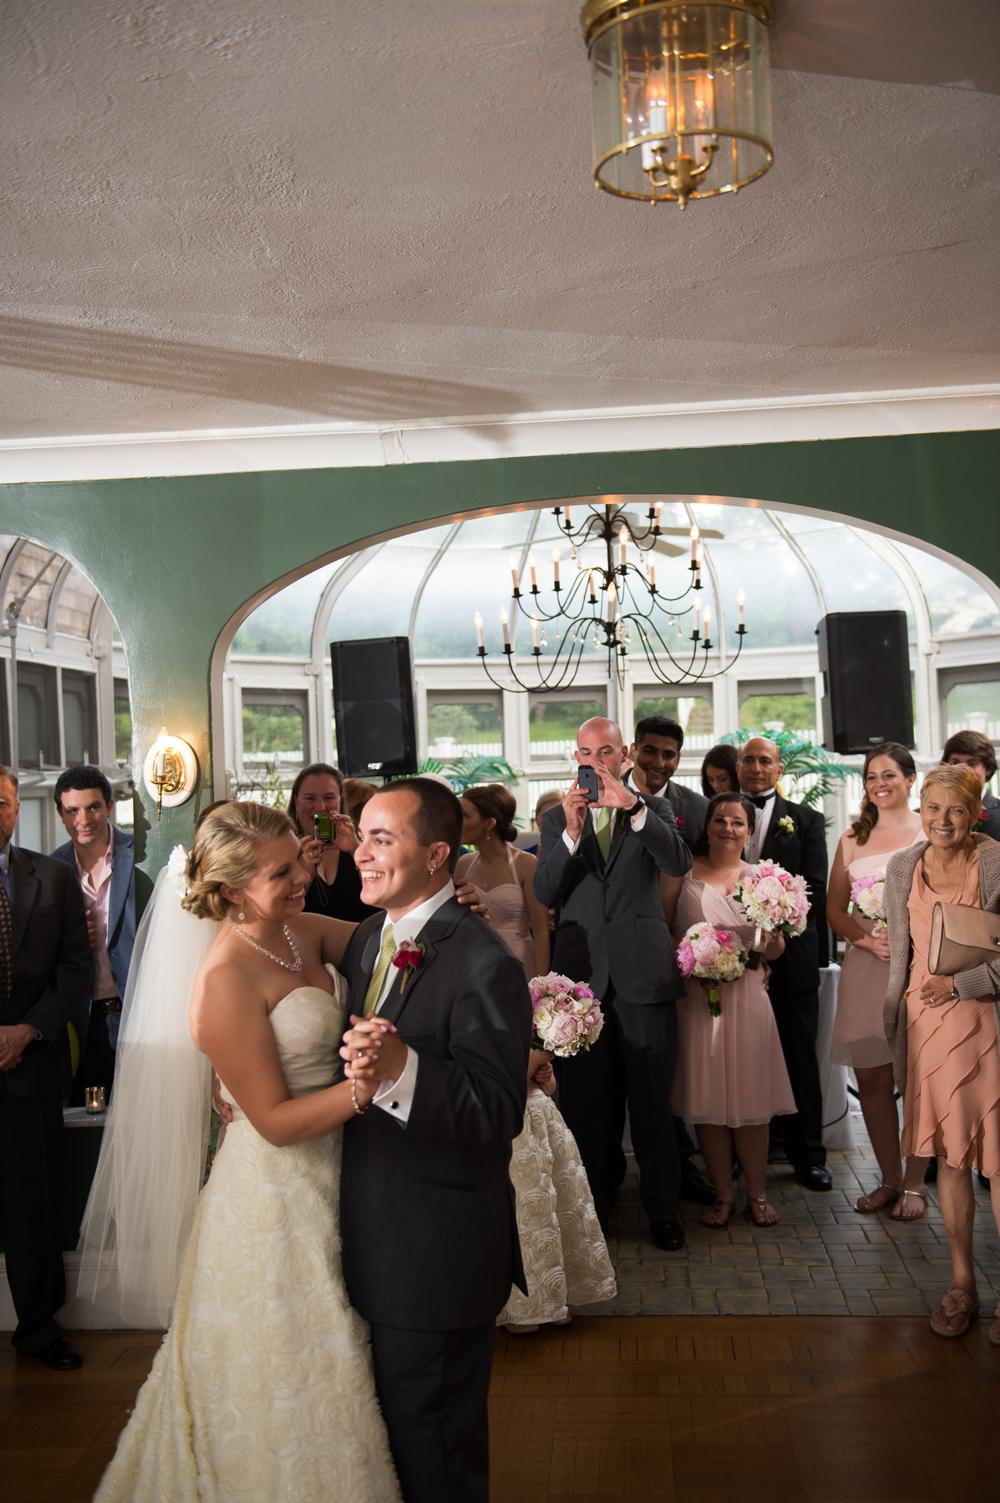 Tarrywile-Mansion-Wedding-Greg-Lewis-Photo-104